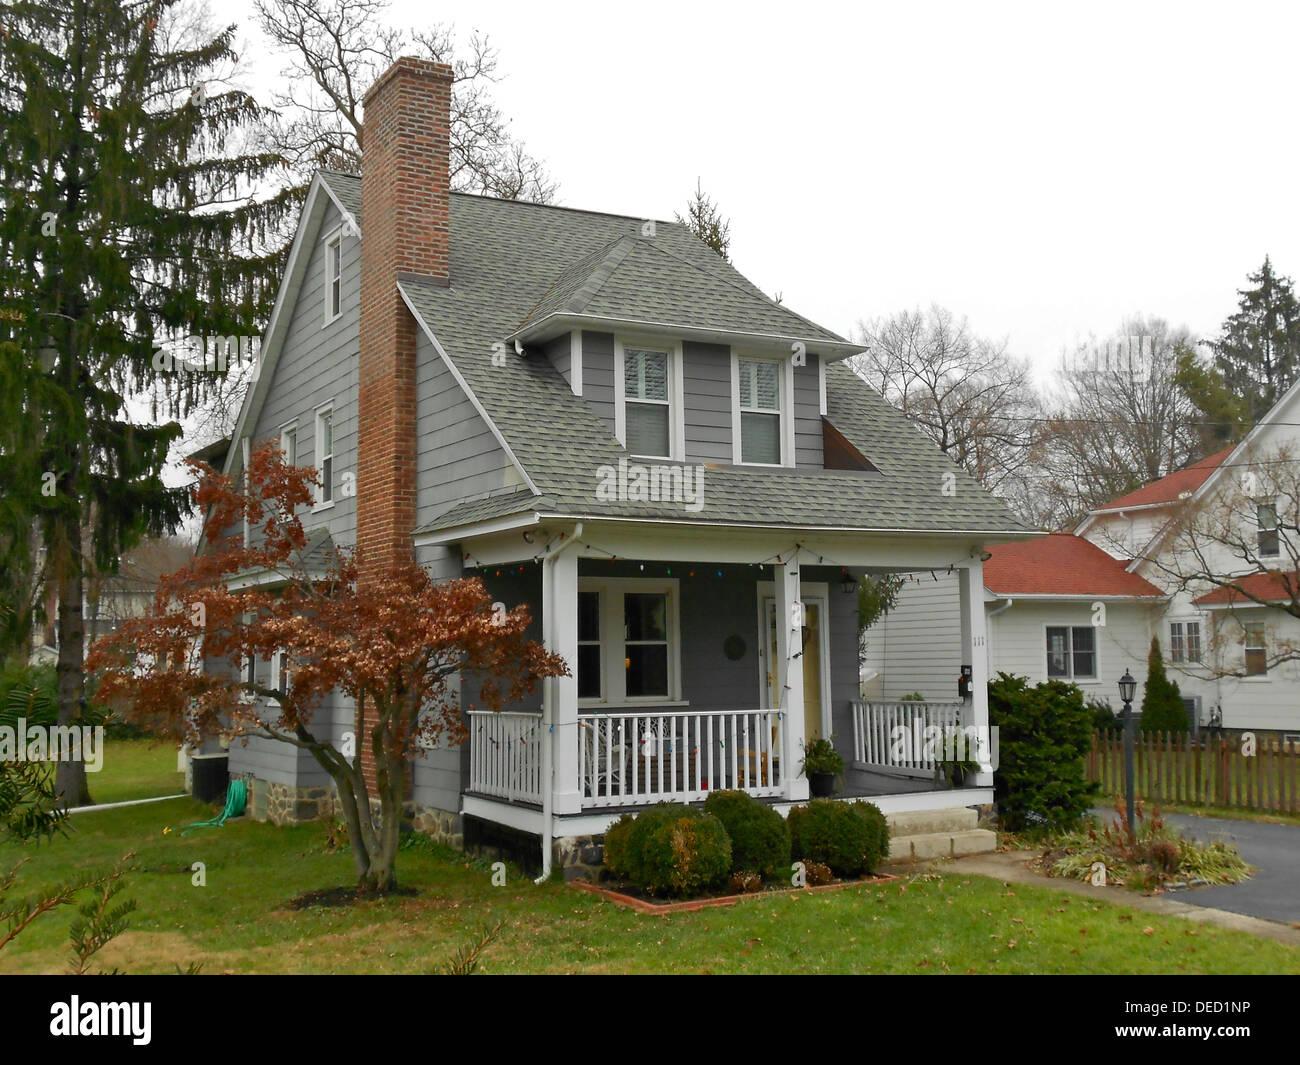 House in the North Wayne Historic District in Wayne, Pennsylvania on the Main Line in suburban Philadelphia. The Stock Photo